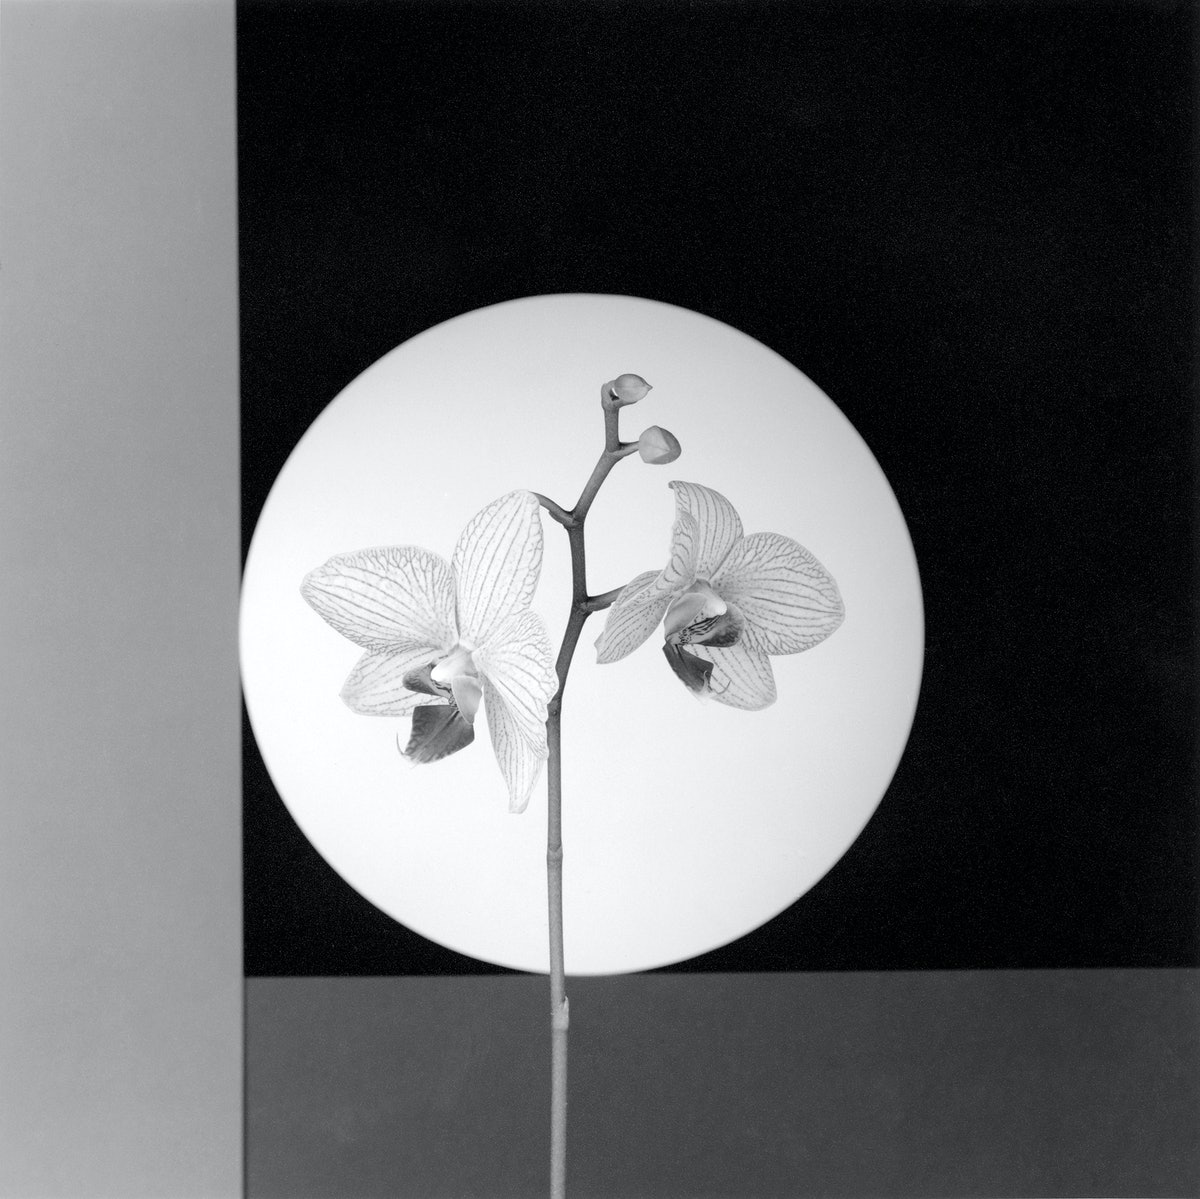 Robert Mapplethorpe's Orchid